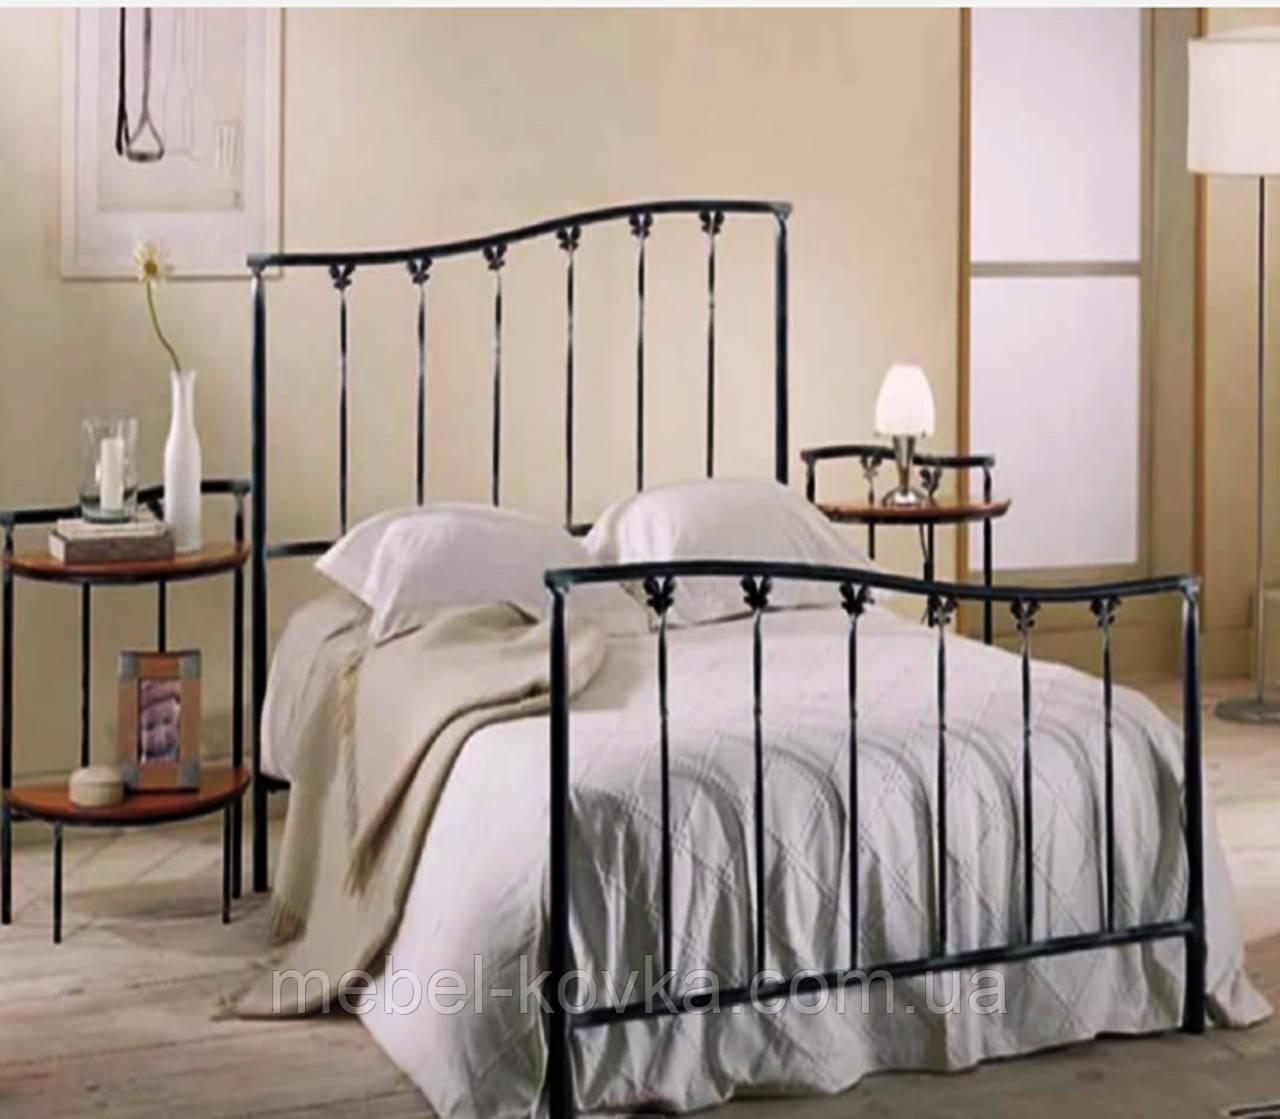 Ліжко коване 82 160х200